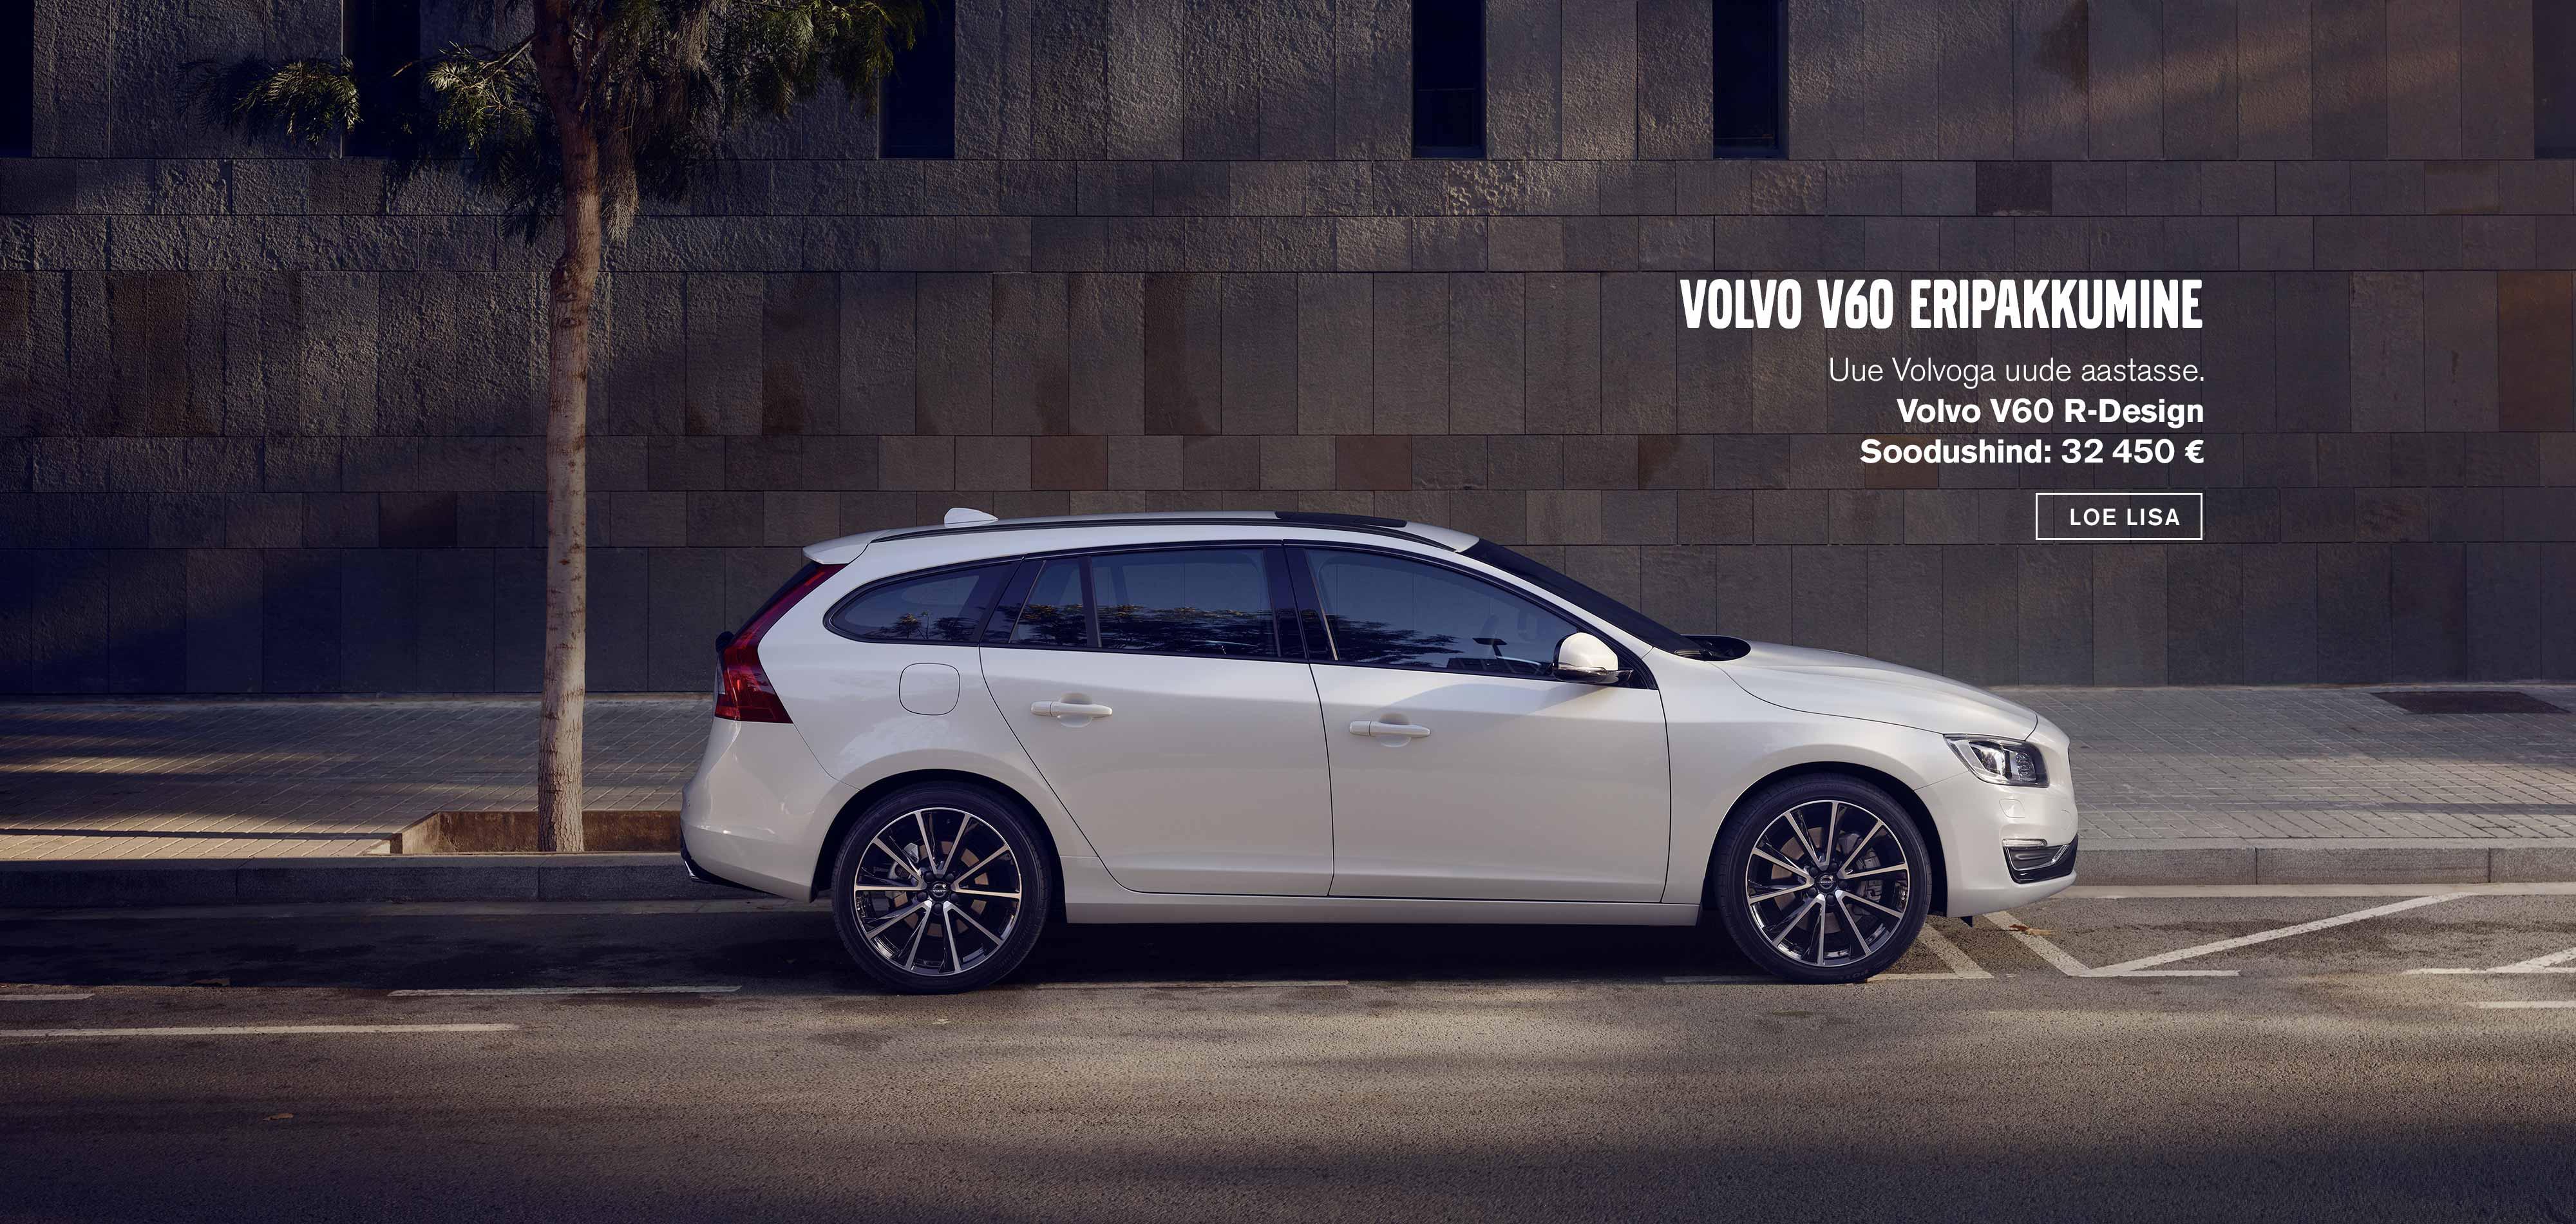 Volvo V60 eripakkumine